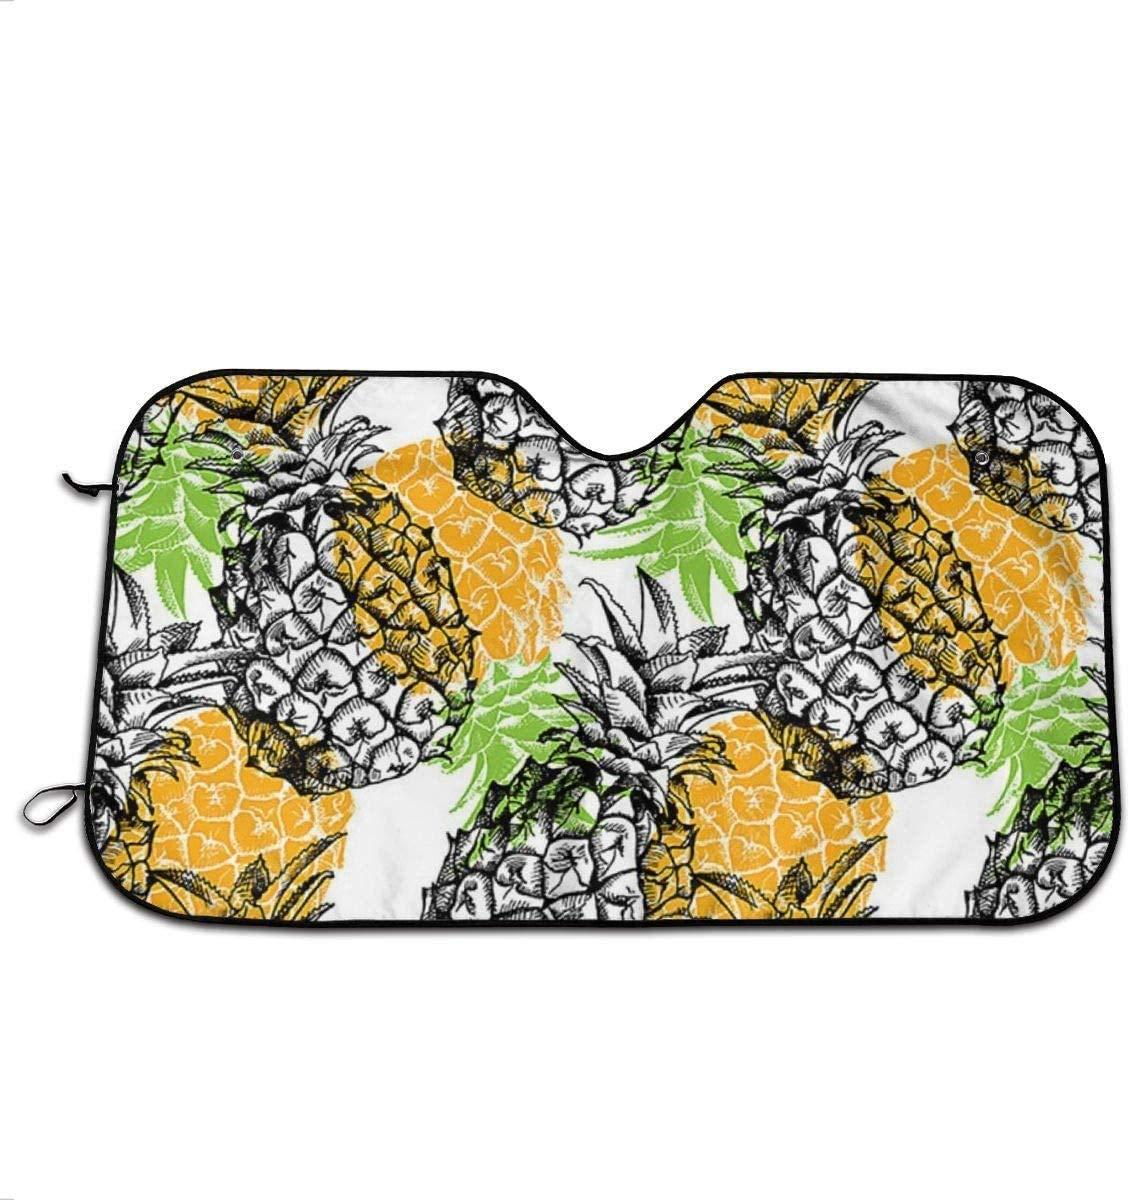 Yellow Pineapple Front Windshield Sun Shade Folding Auto for Car Blocks UV Rays Sun Visor Glare Protector